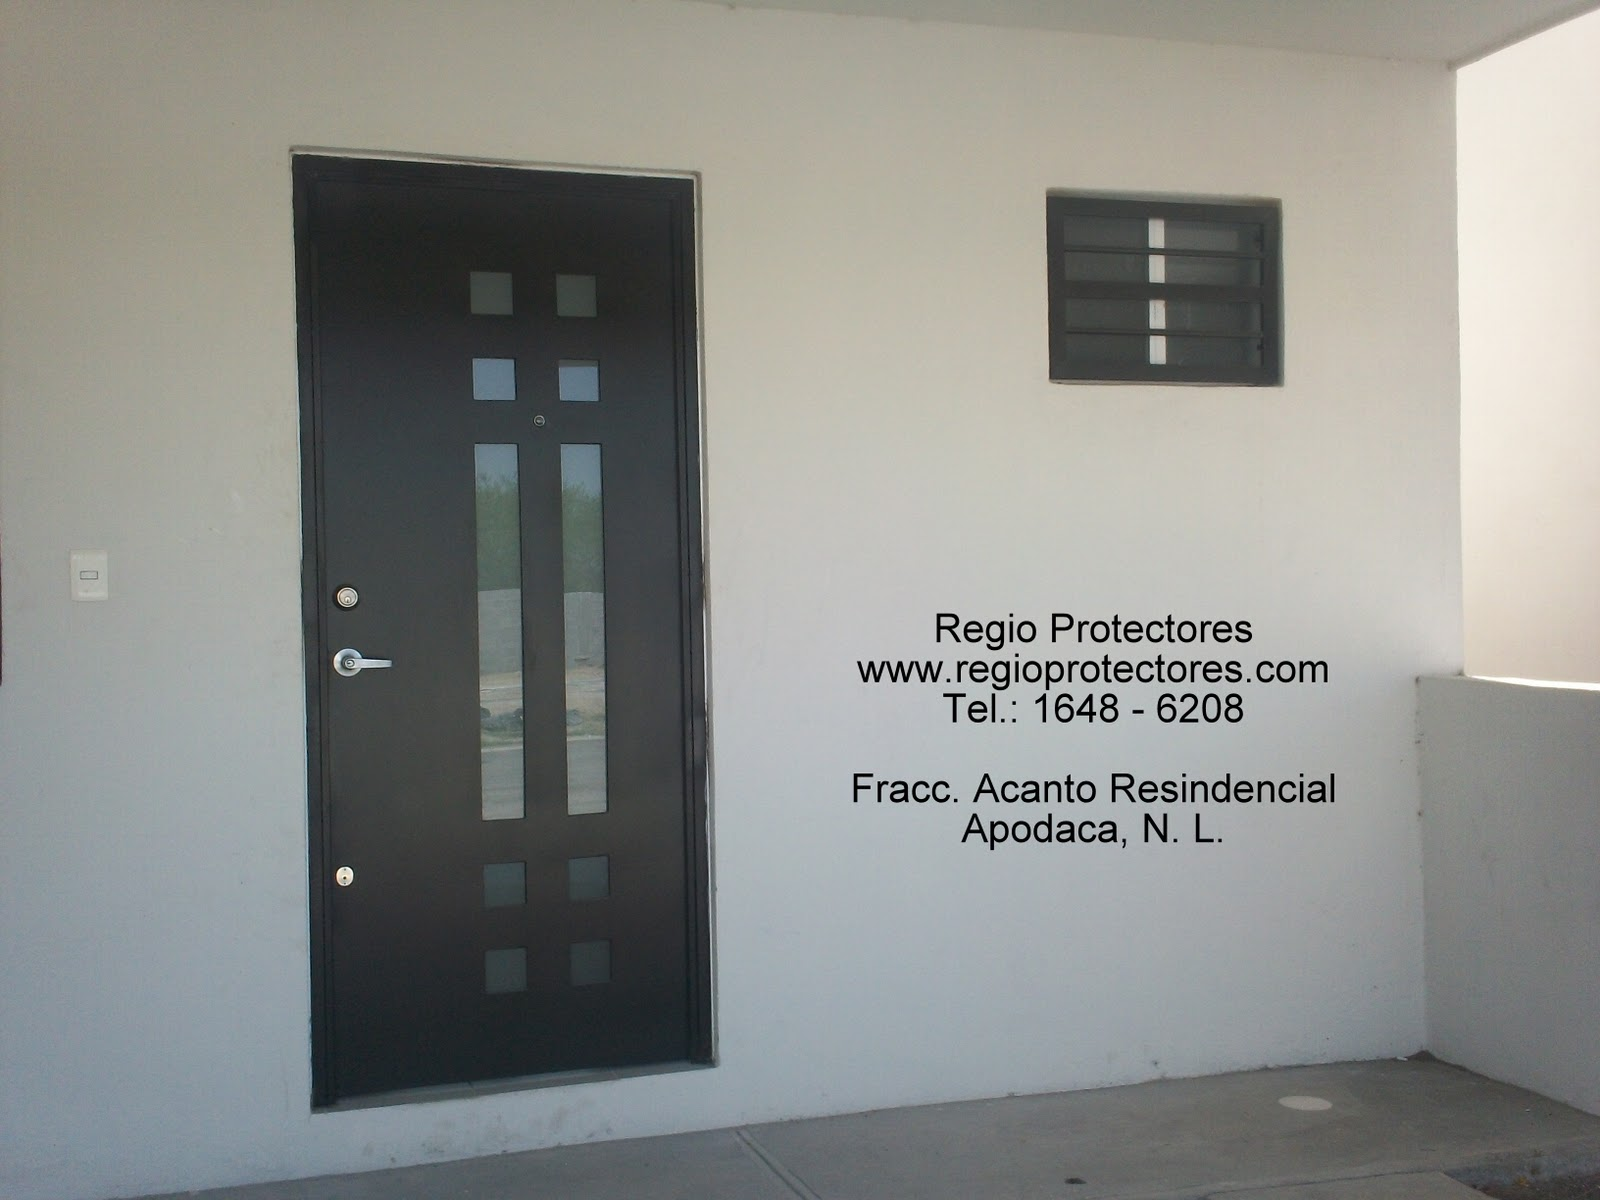 Puertas de herreria contemporaneas car interior design for Puertas de herreria para entrada principal